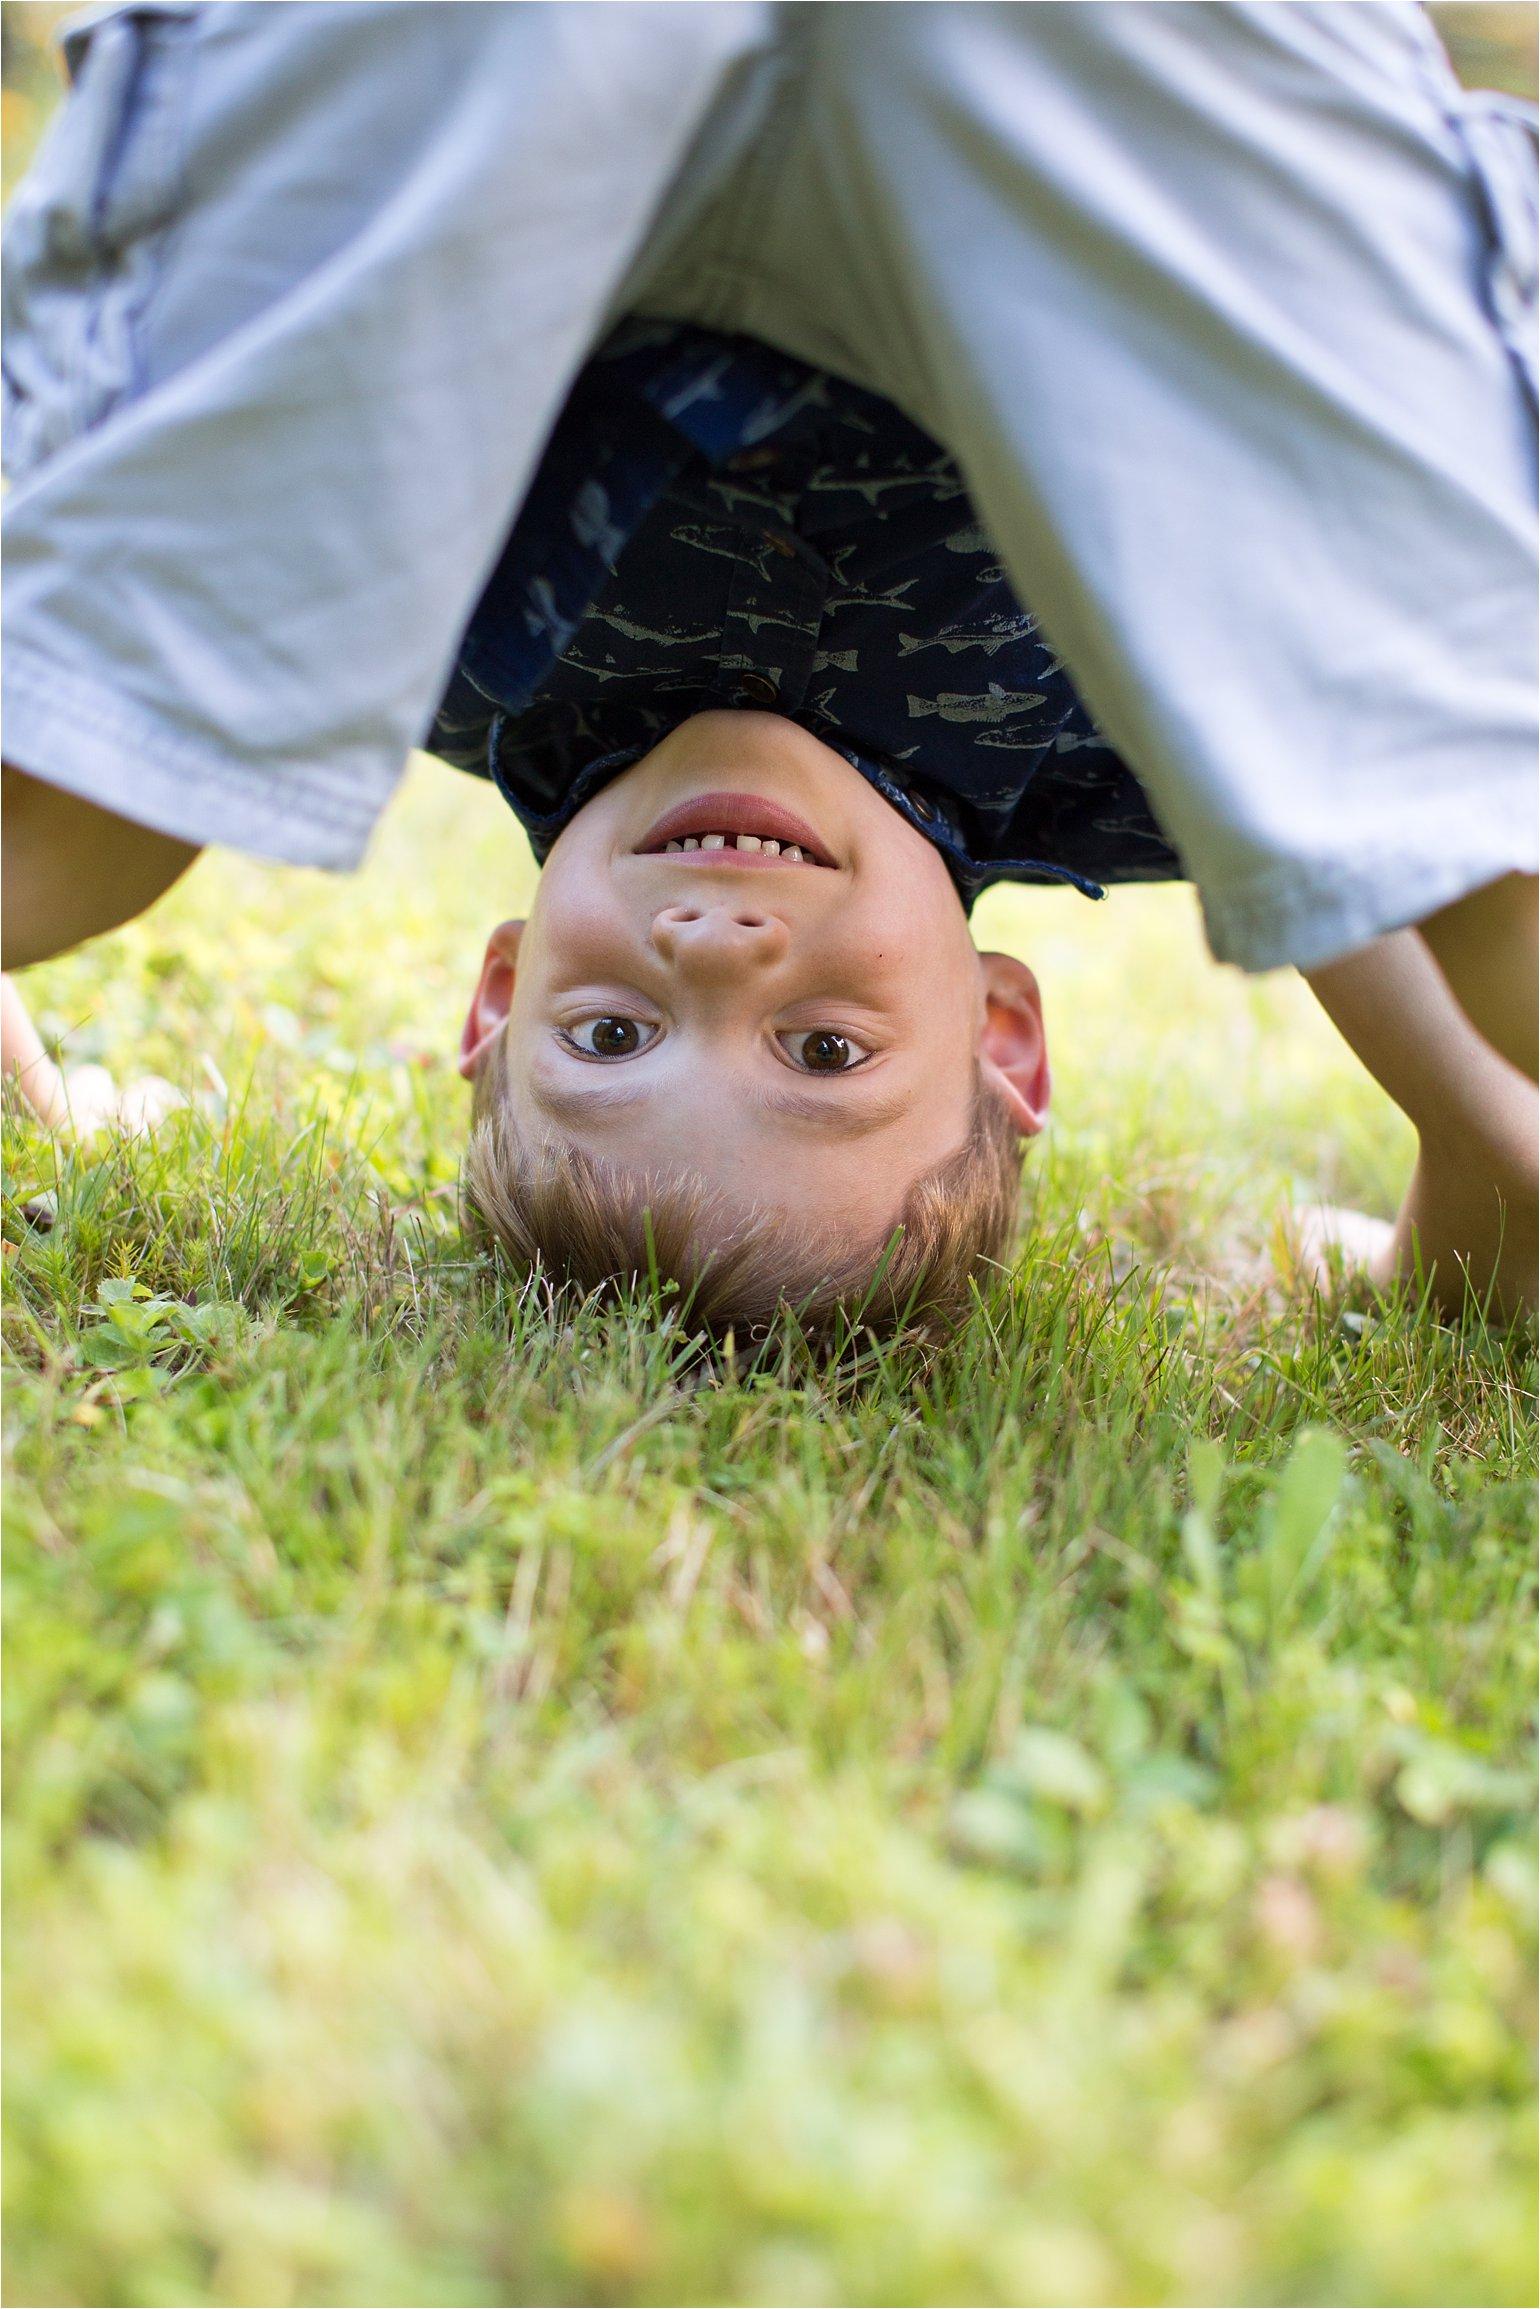 Boy Doing Somersault © 2015 Maundy Mitchell